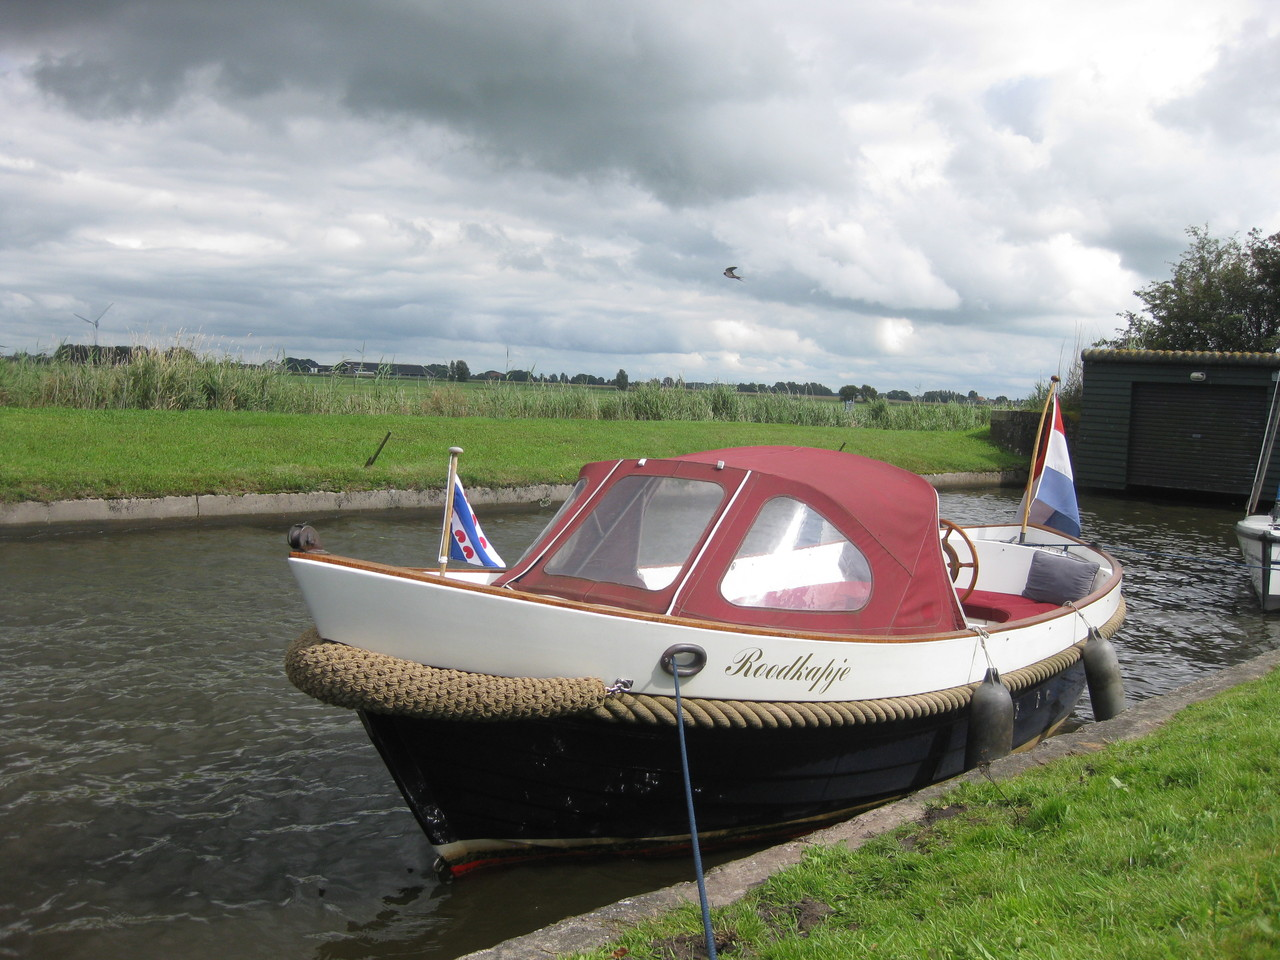 www.bungalowparkgarijp.nl - Schaluppe mieten